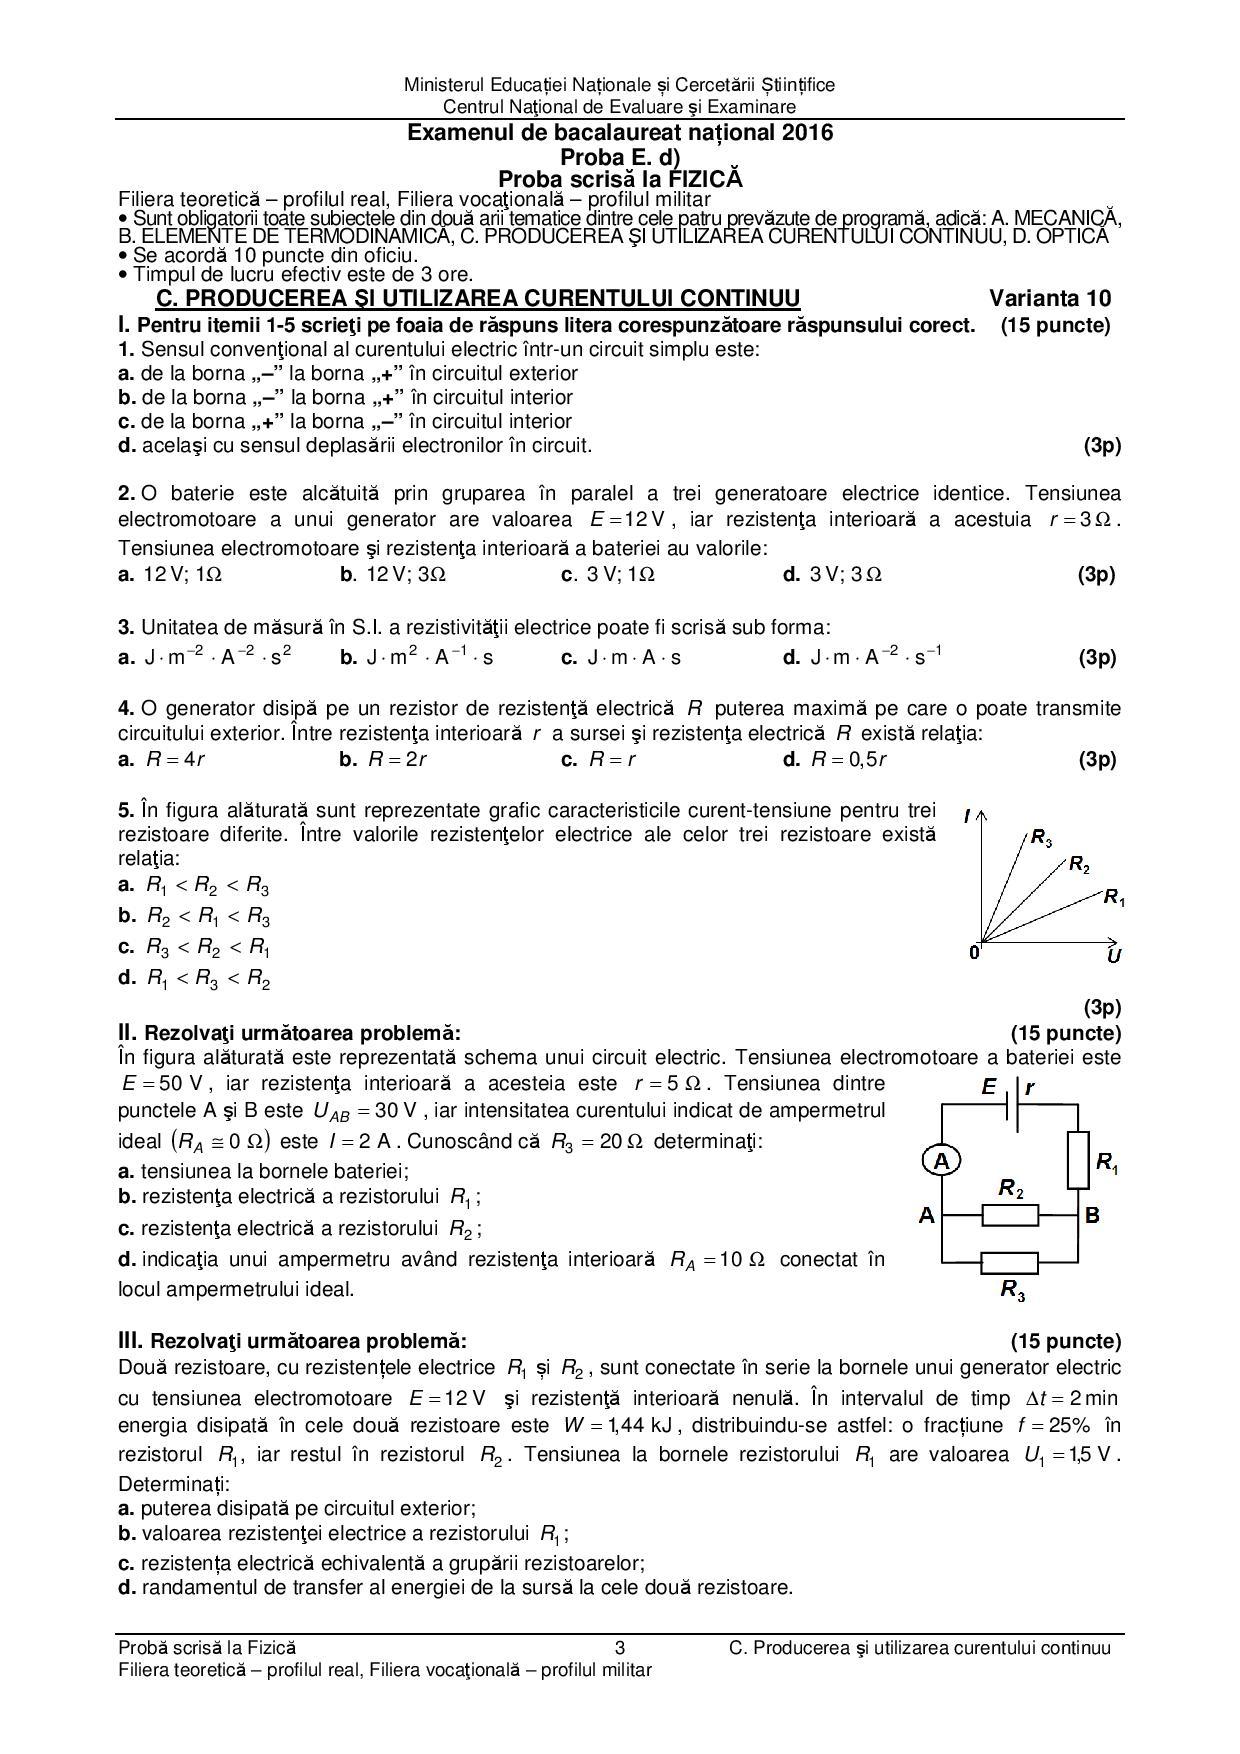 E_d_fizica_teoretic_vocational_2016_var_10_LRO-page-003